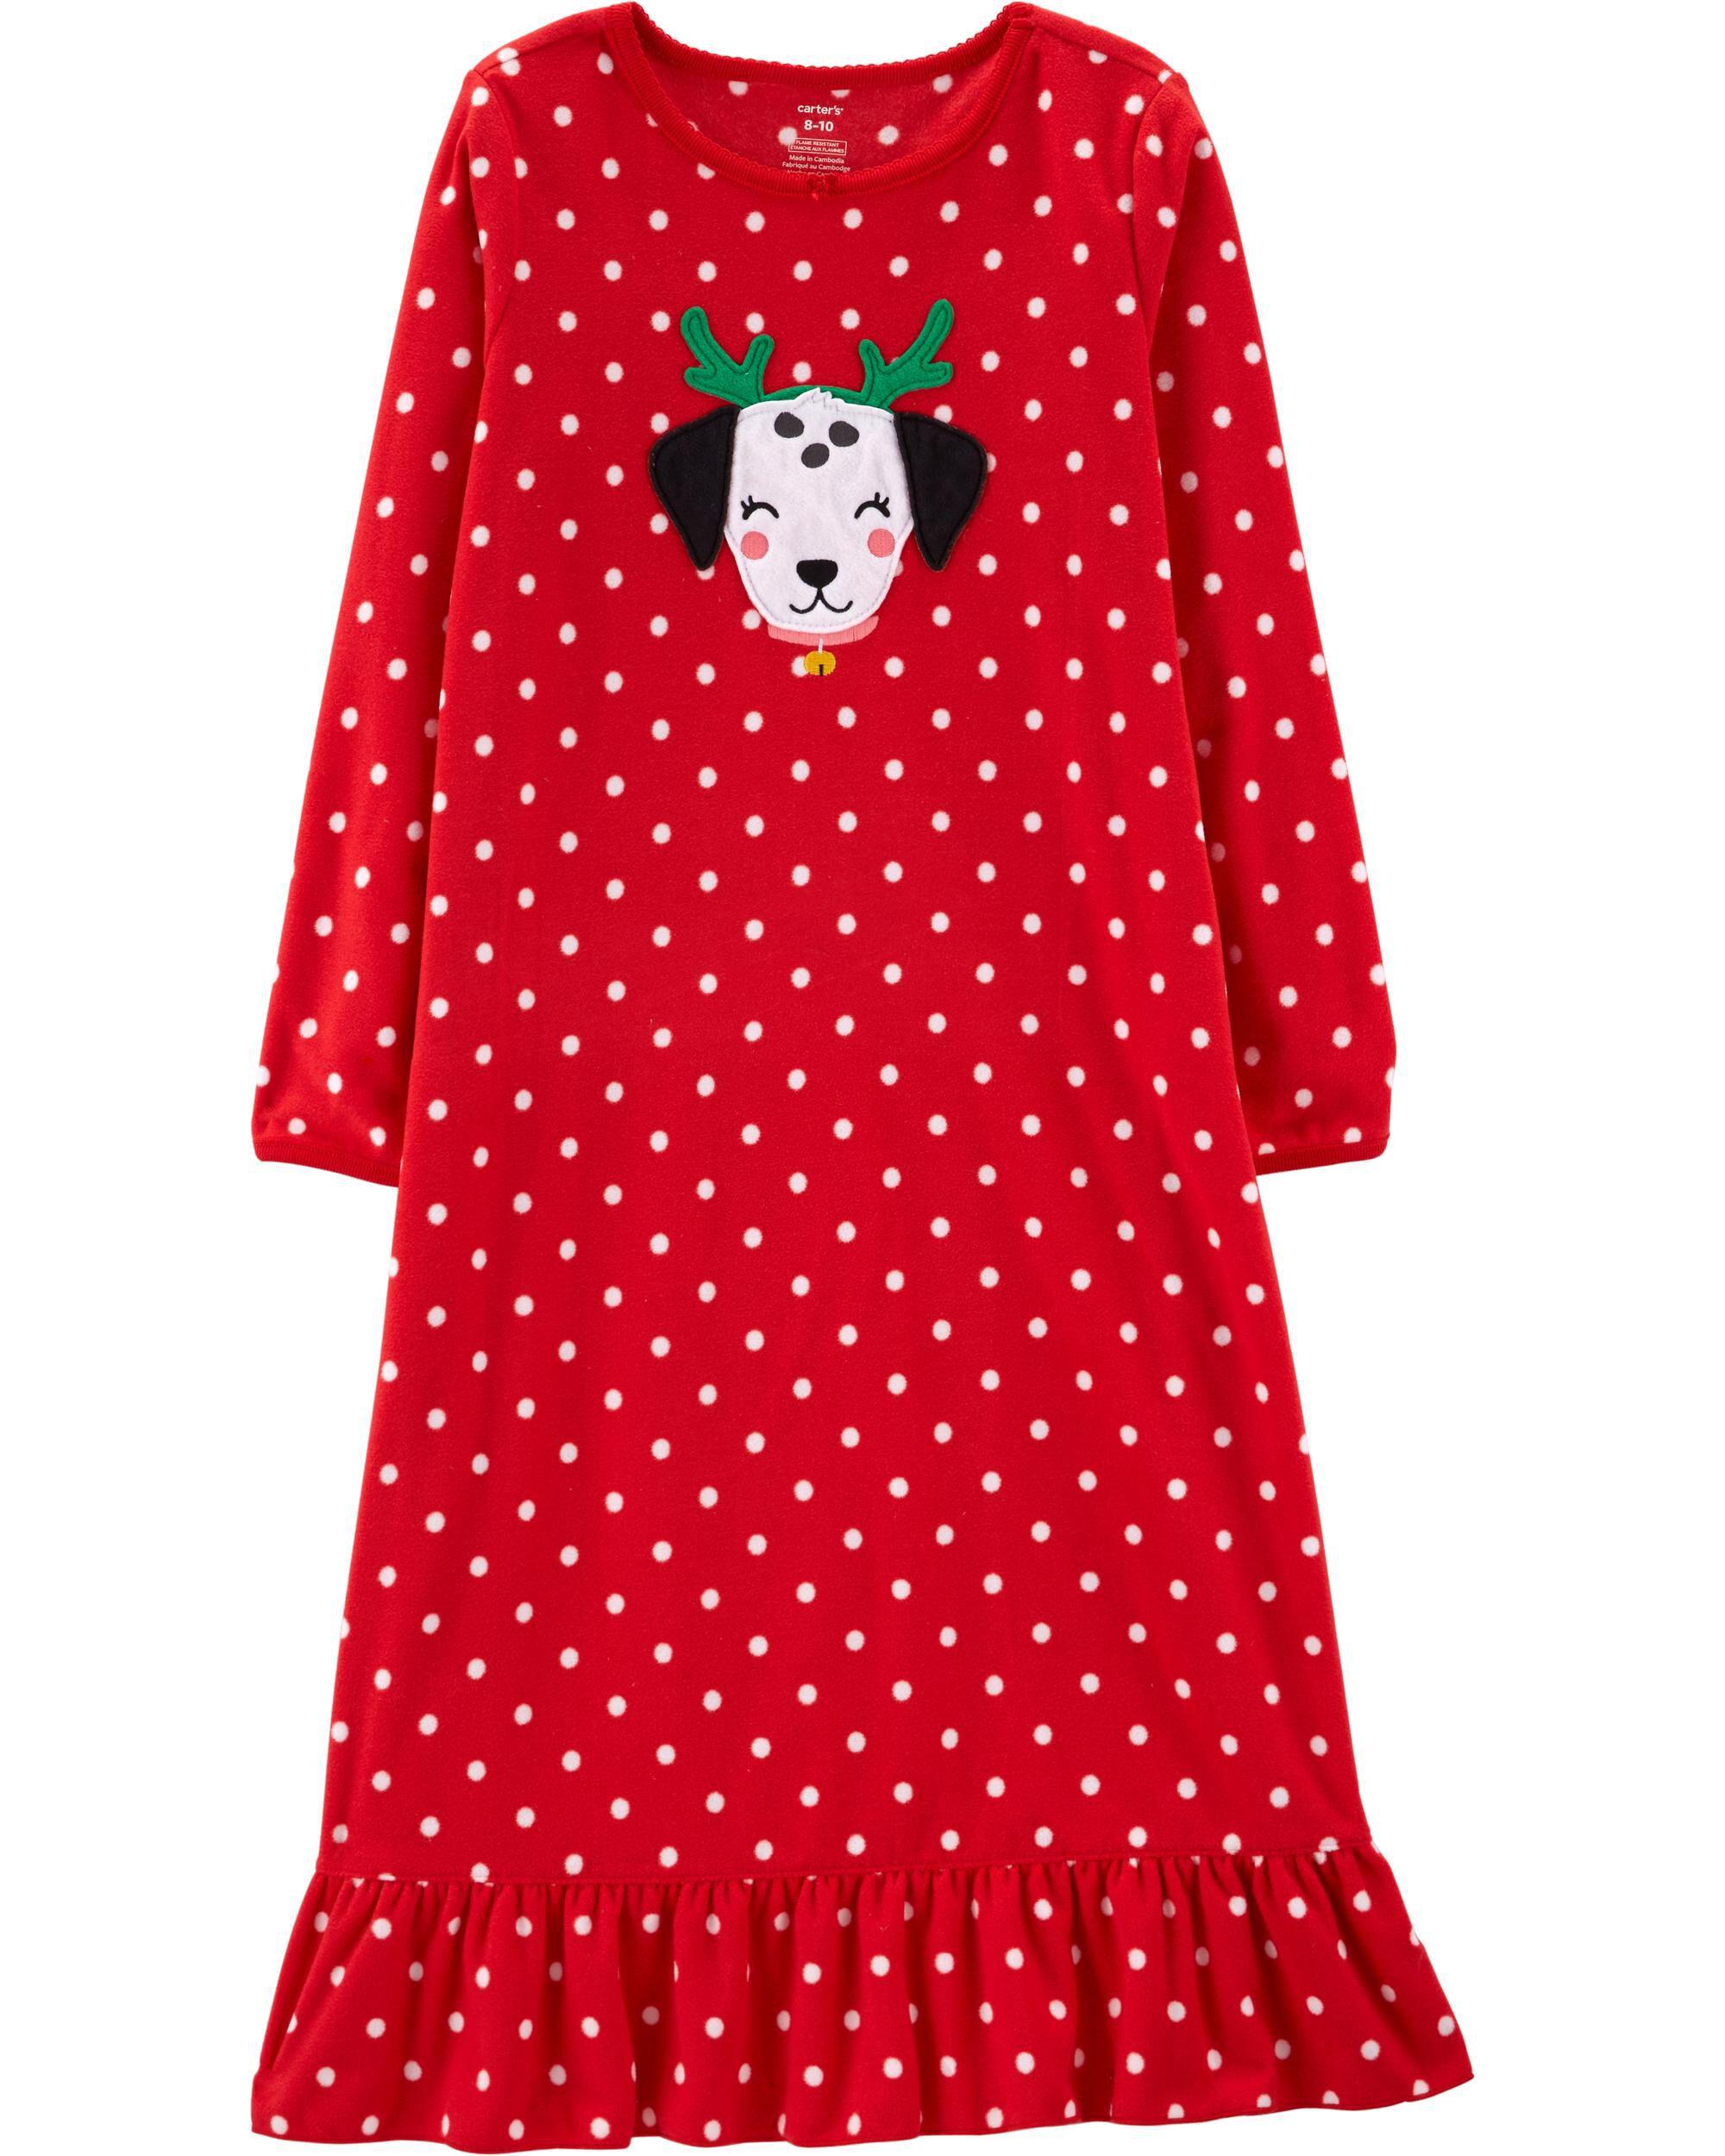 8fed7a9593da Christmas Dog Fleece Nightgown